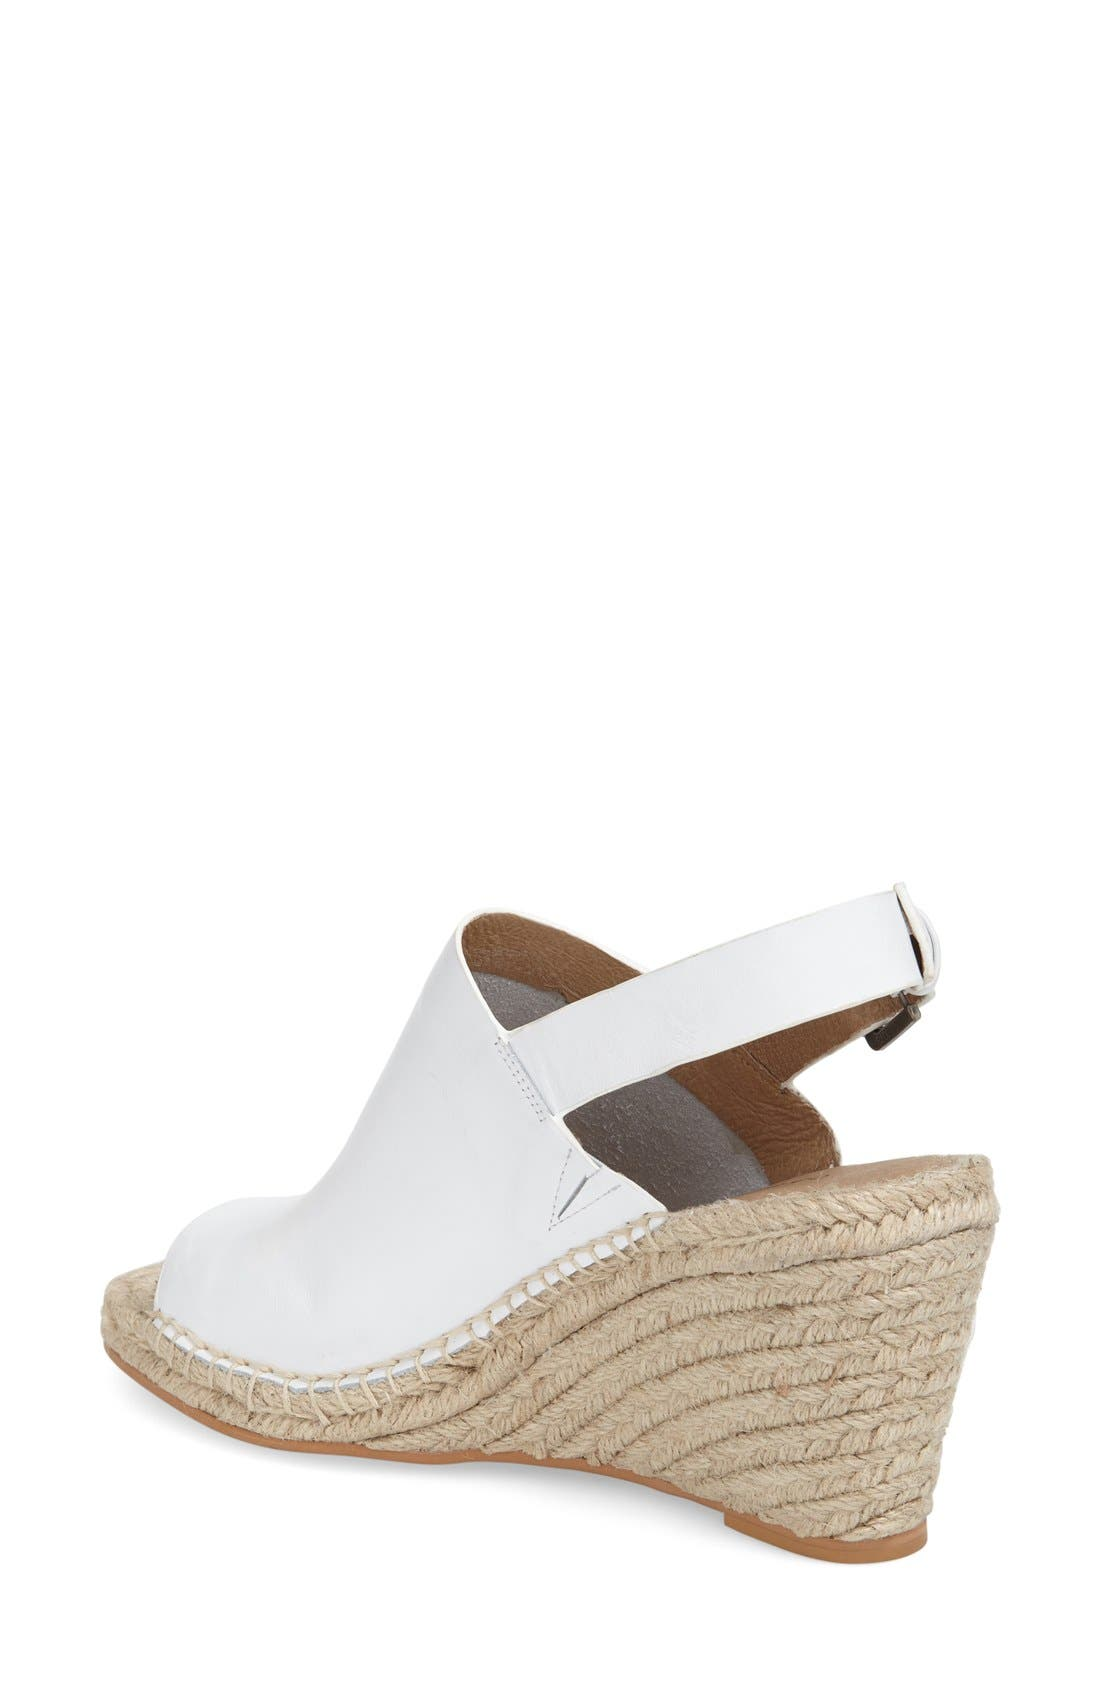 Womens Caslon Shoes Nordstrom Austin Wedges Meagan Brown Cokelat 40